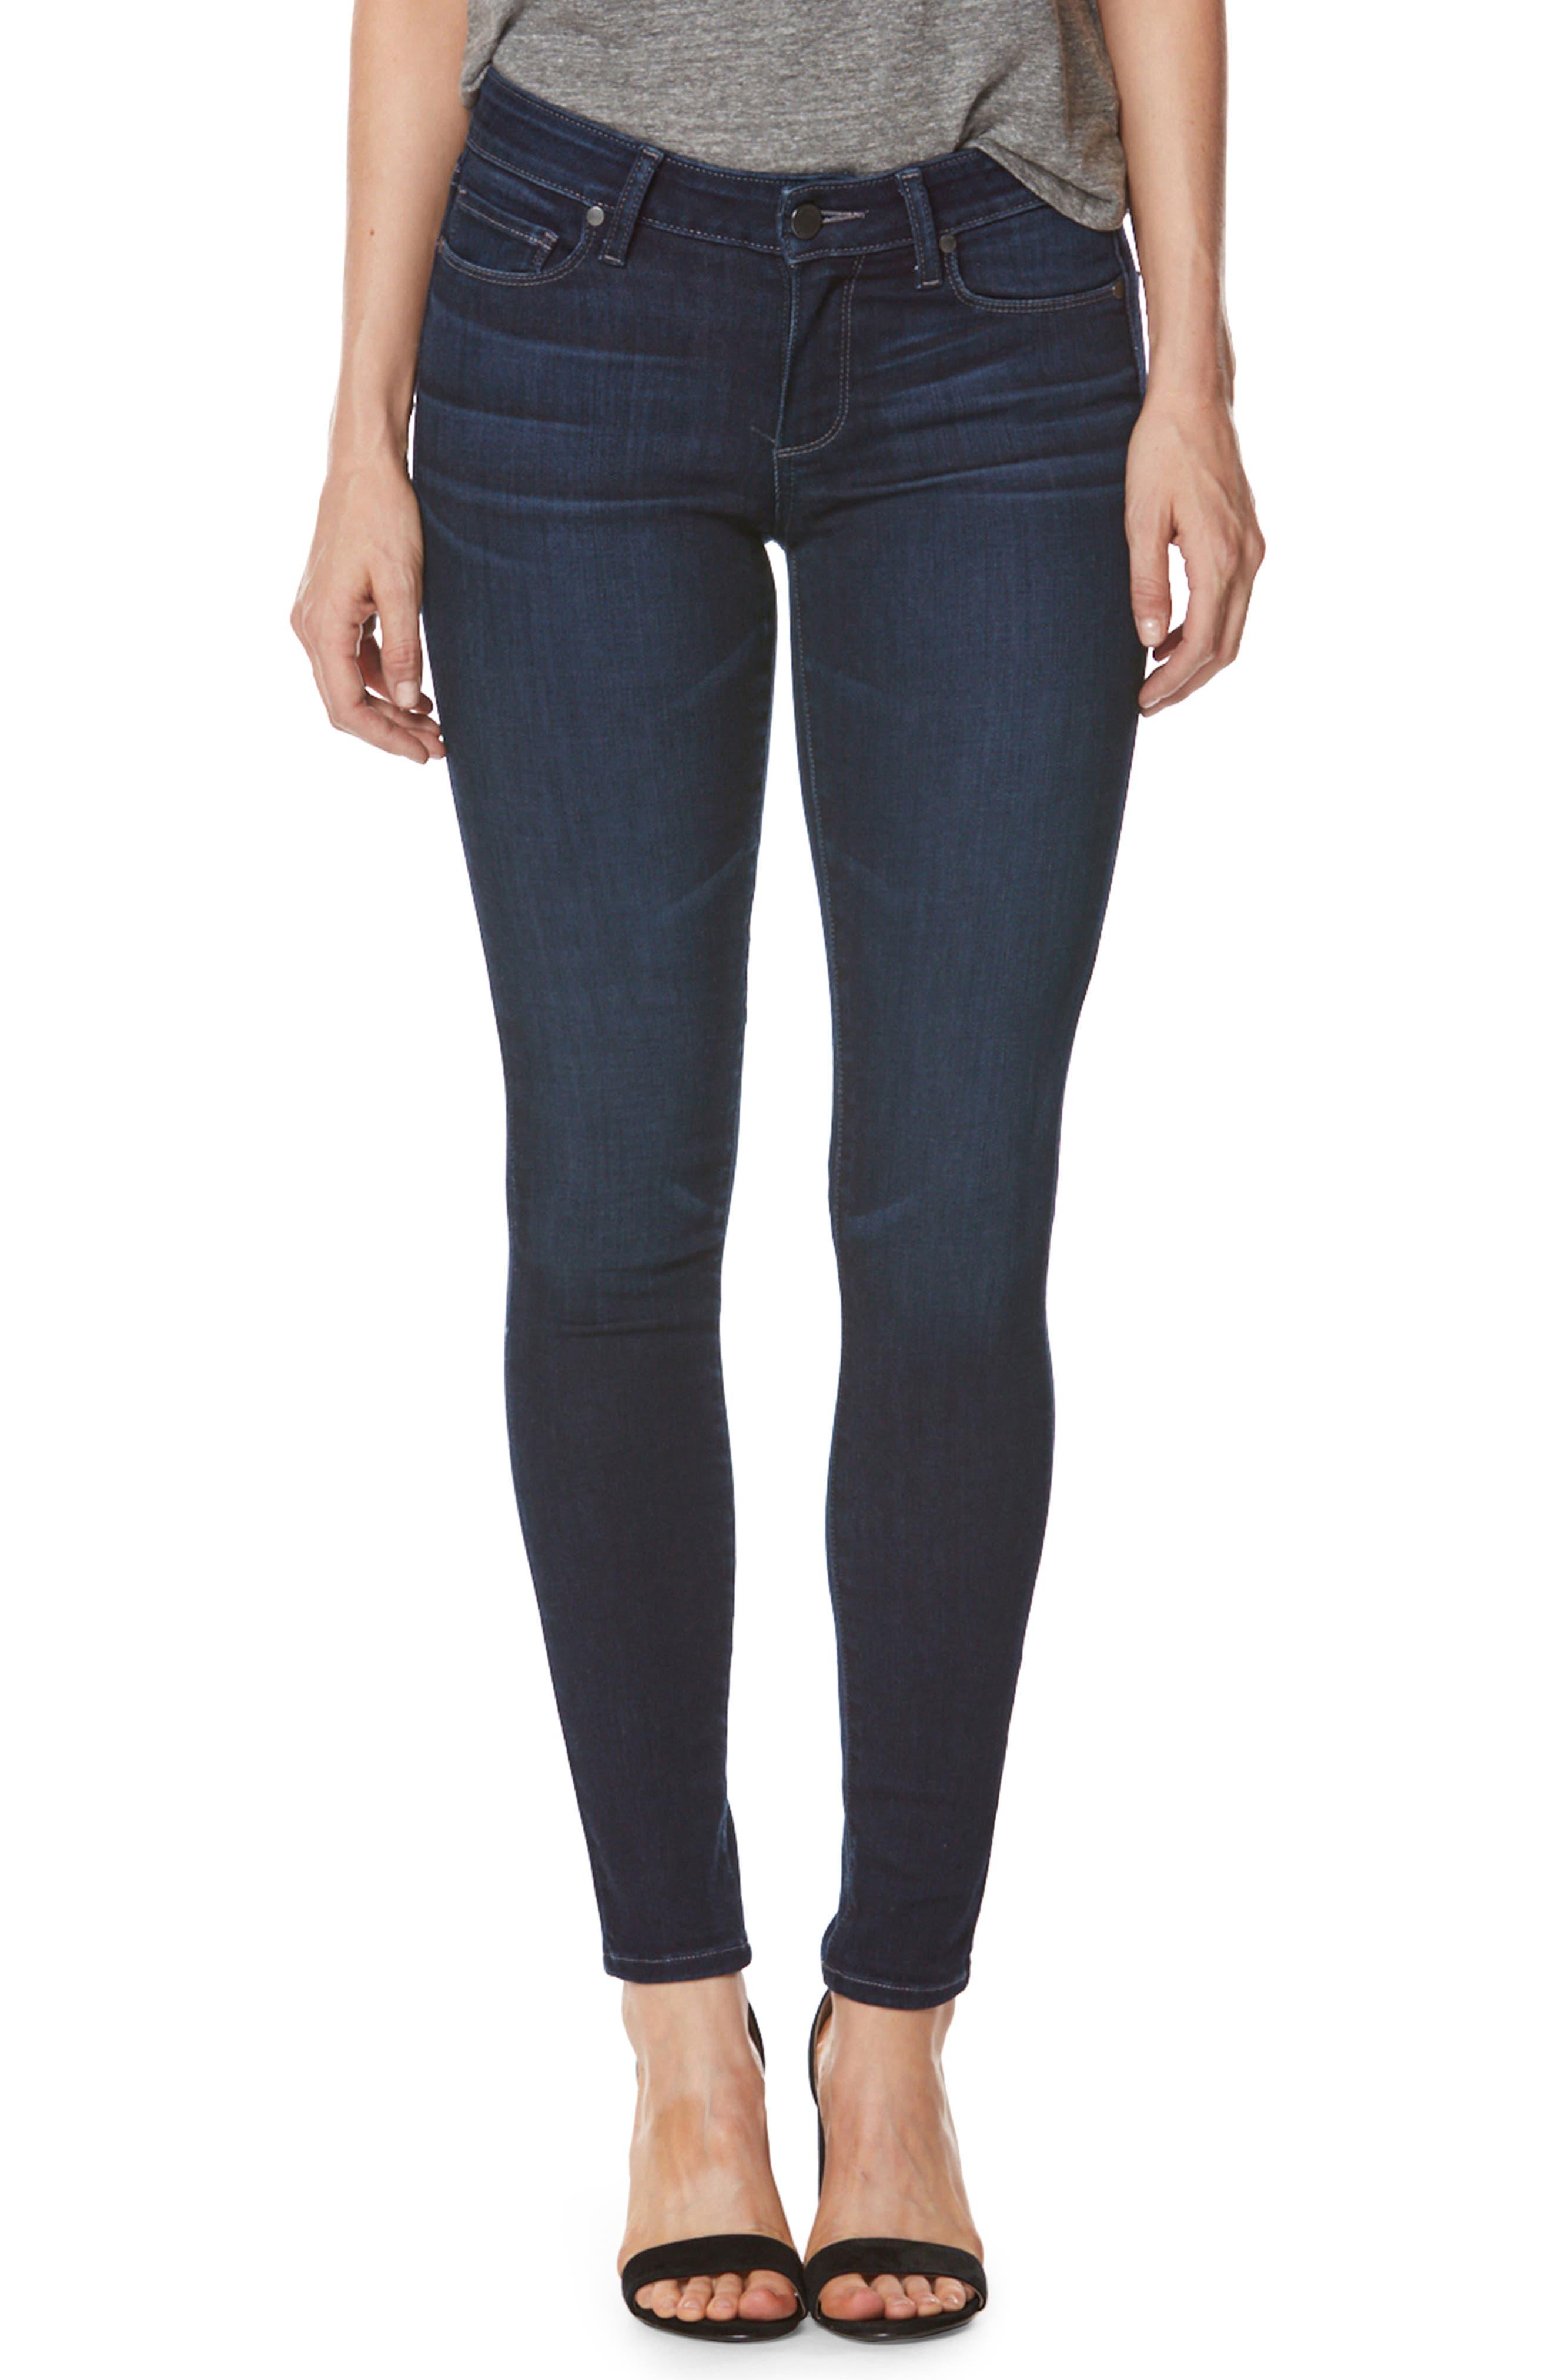 PAIGE Transcend Vintage - Verdugo High Waist Ankle Skinny Jeans